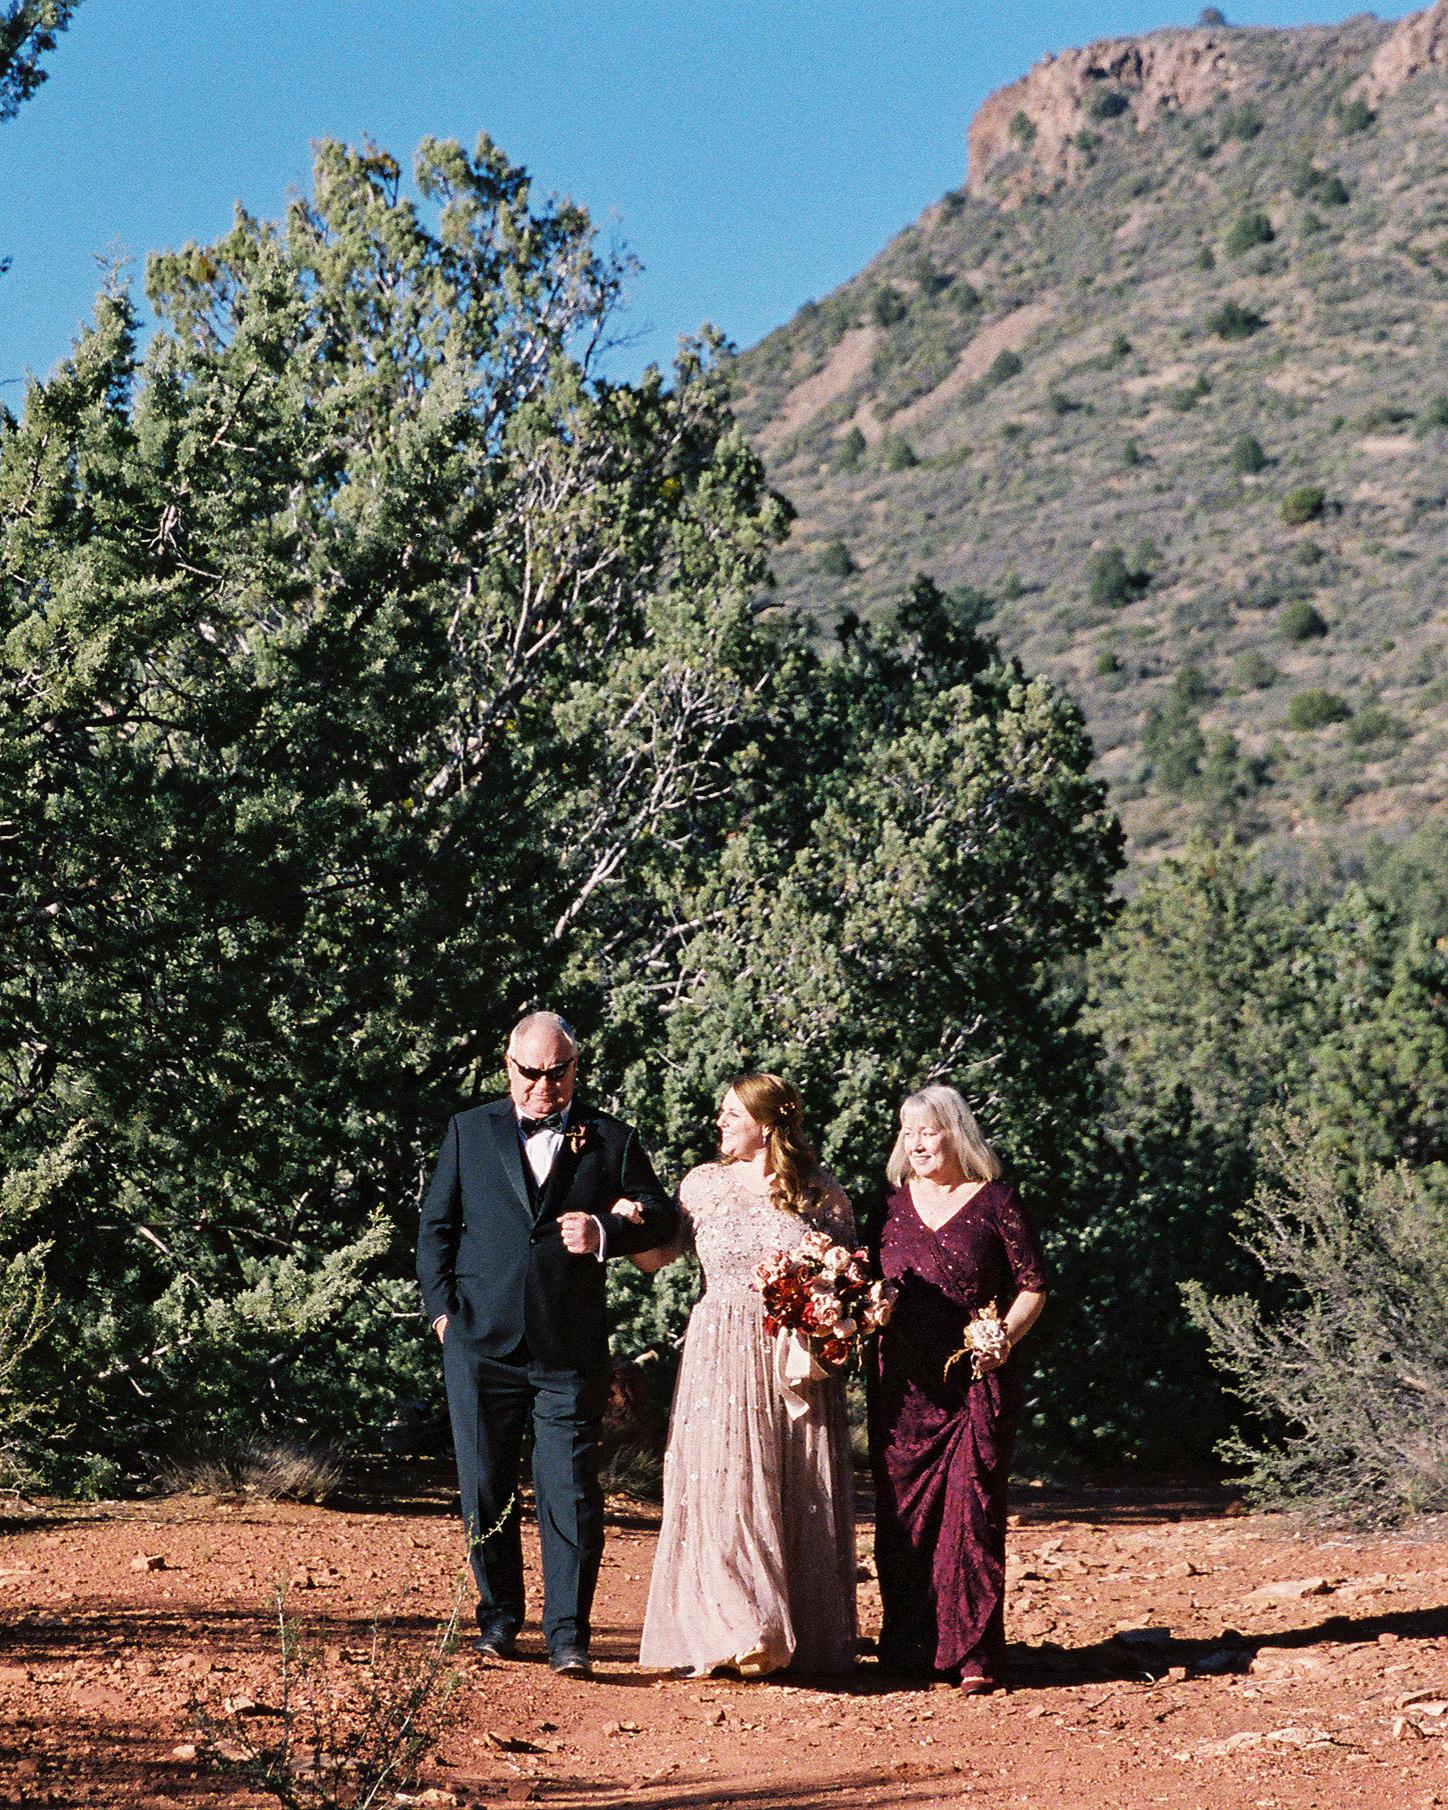 stefanie terrel wedding processional bride and parents